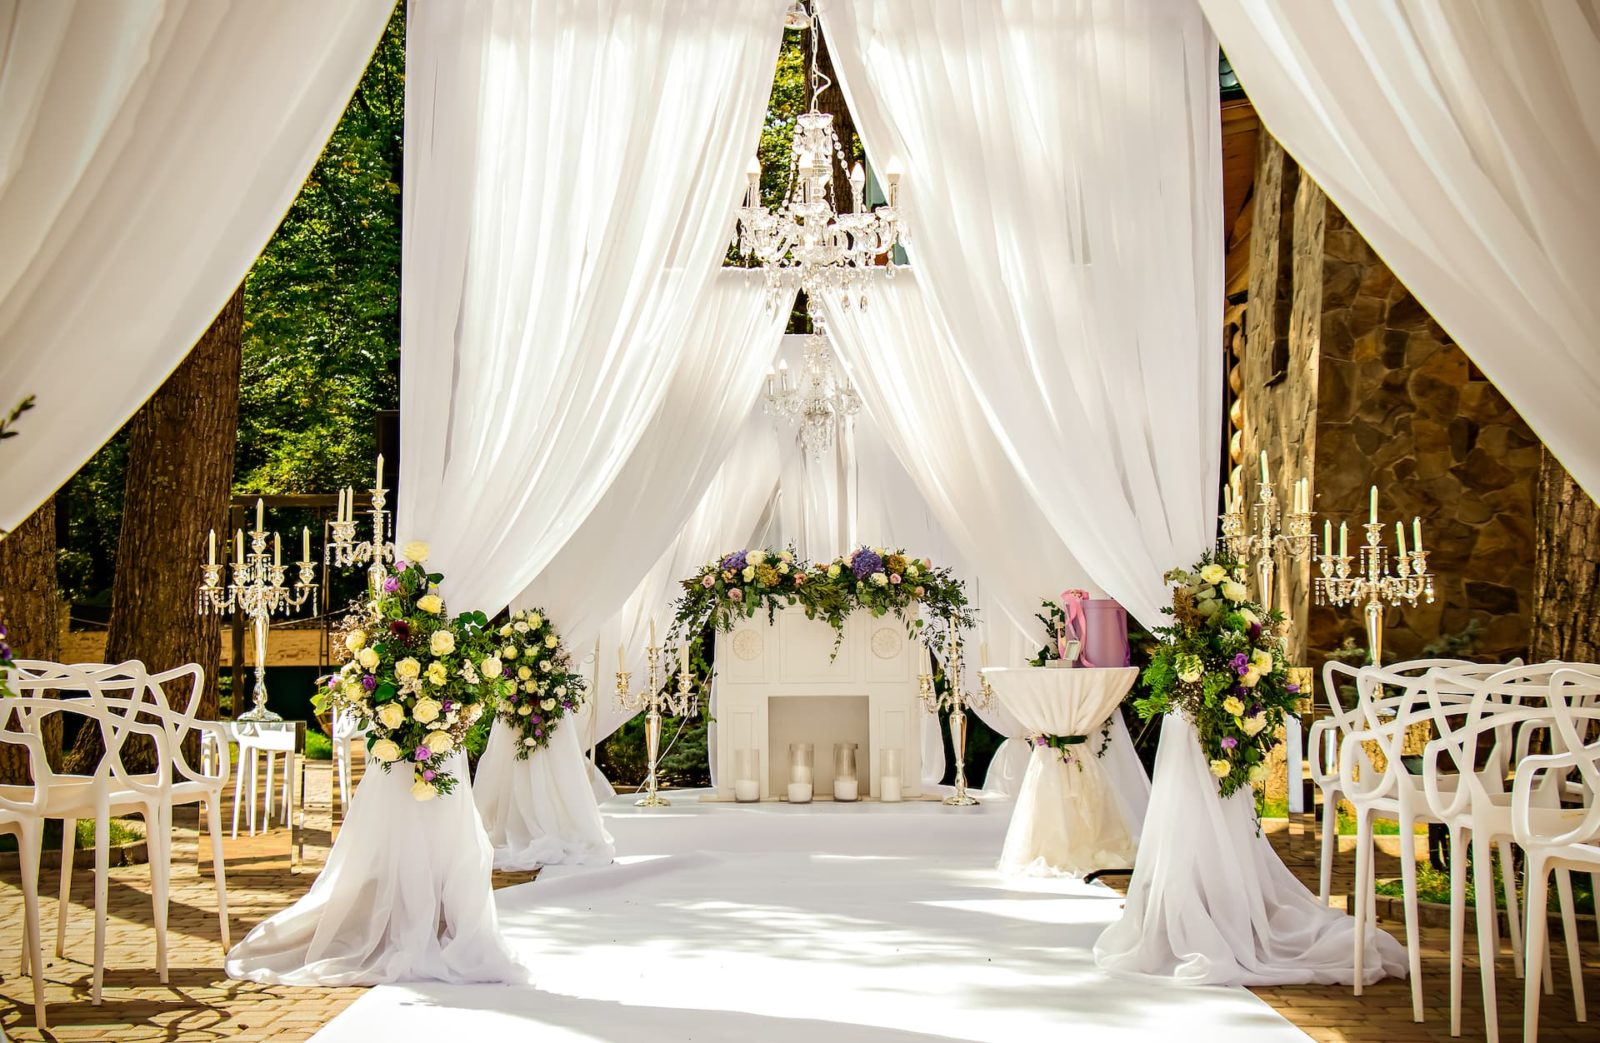 Decorating an Outdoor Wedding Reception